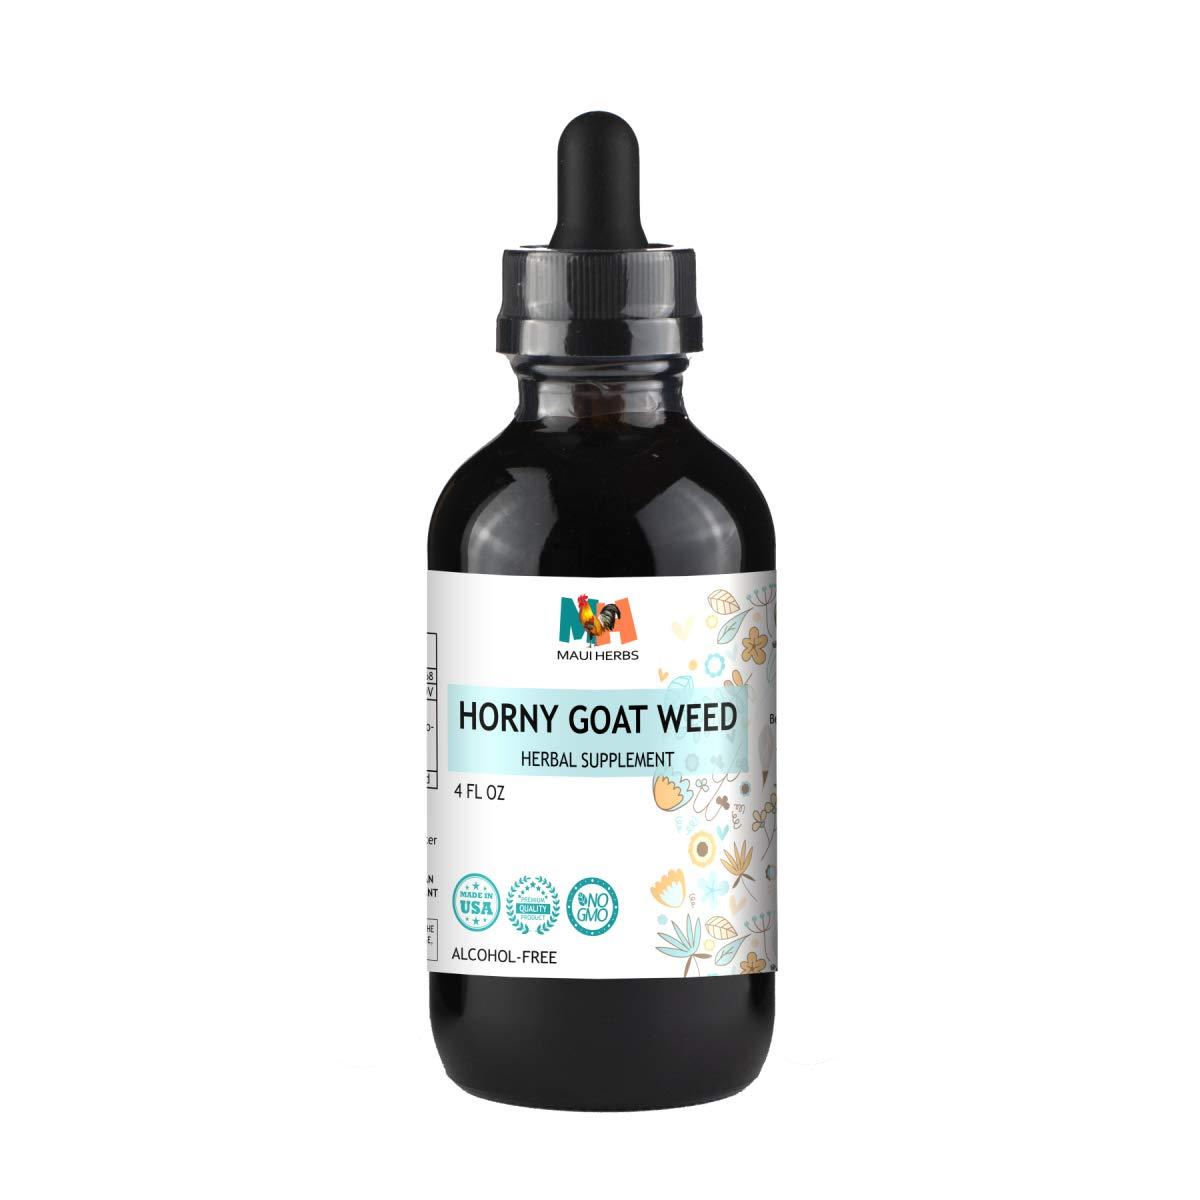 Horny Goat Weed Tincture Alcohol-Free Liquid Extract, Organic Horny Goat Weed Leaf (Epimedium Grandiflorum, Barrenwort) (4 FL OZ)